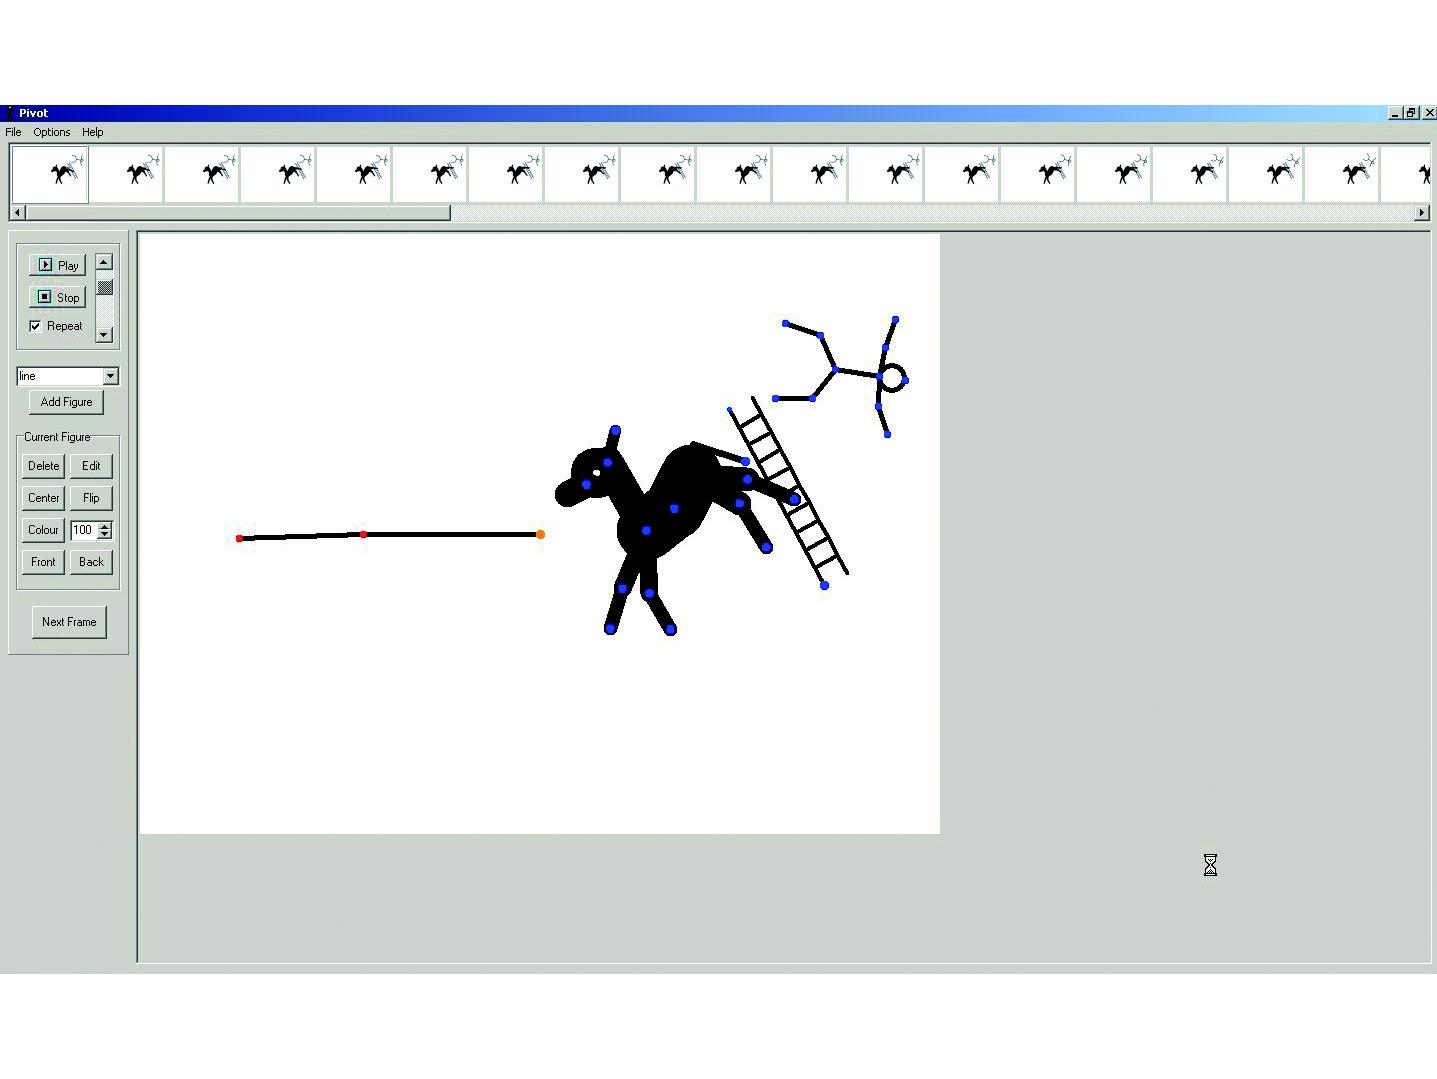 Pivot Videospivot Stickfigure Animator